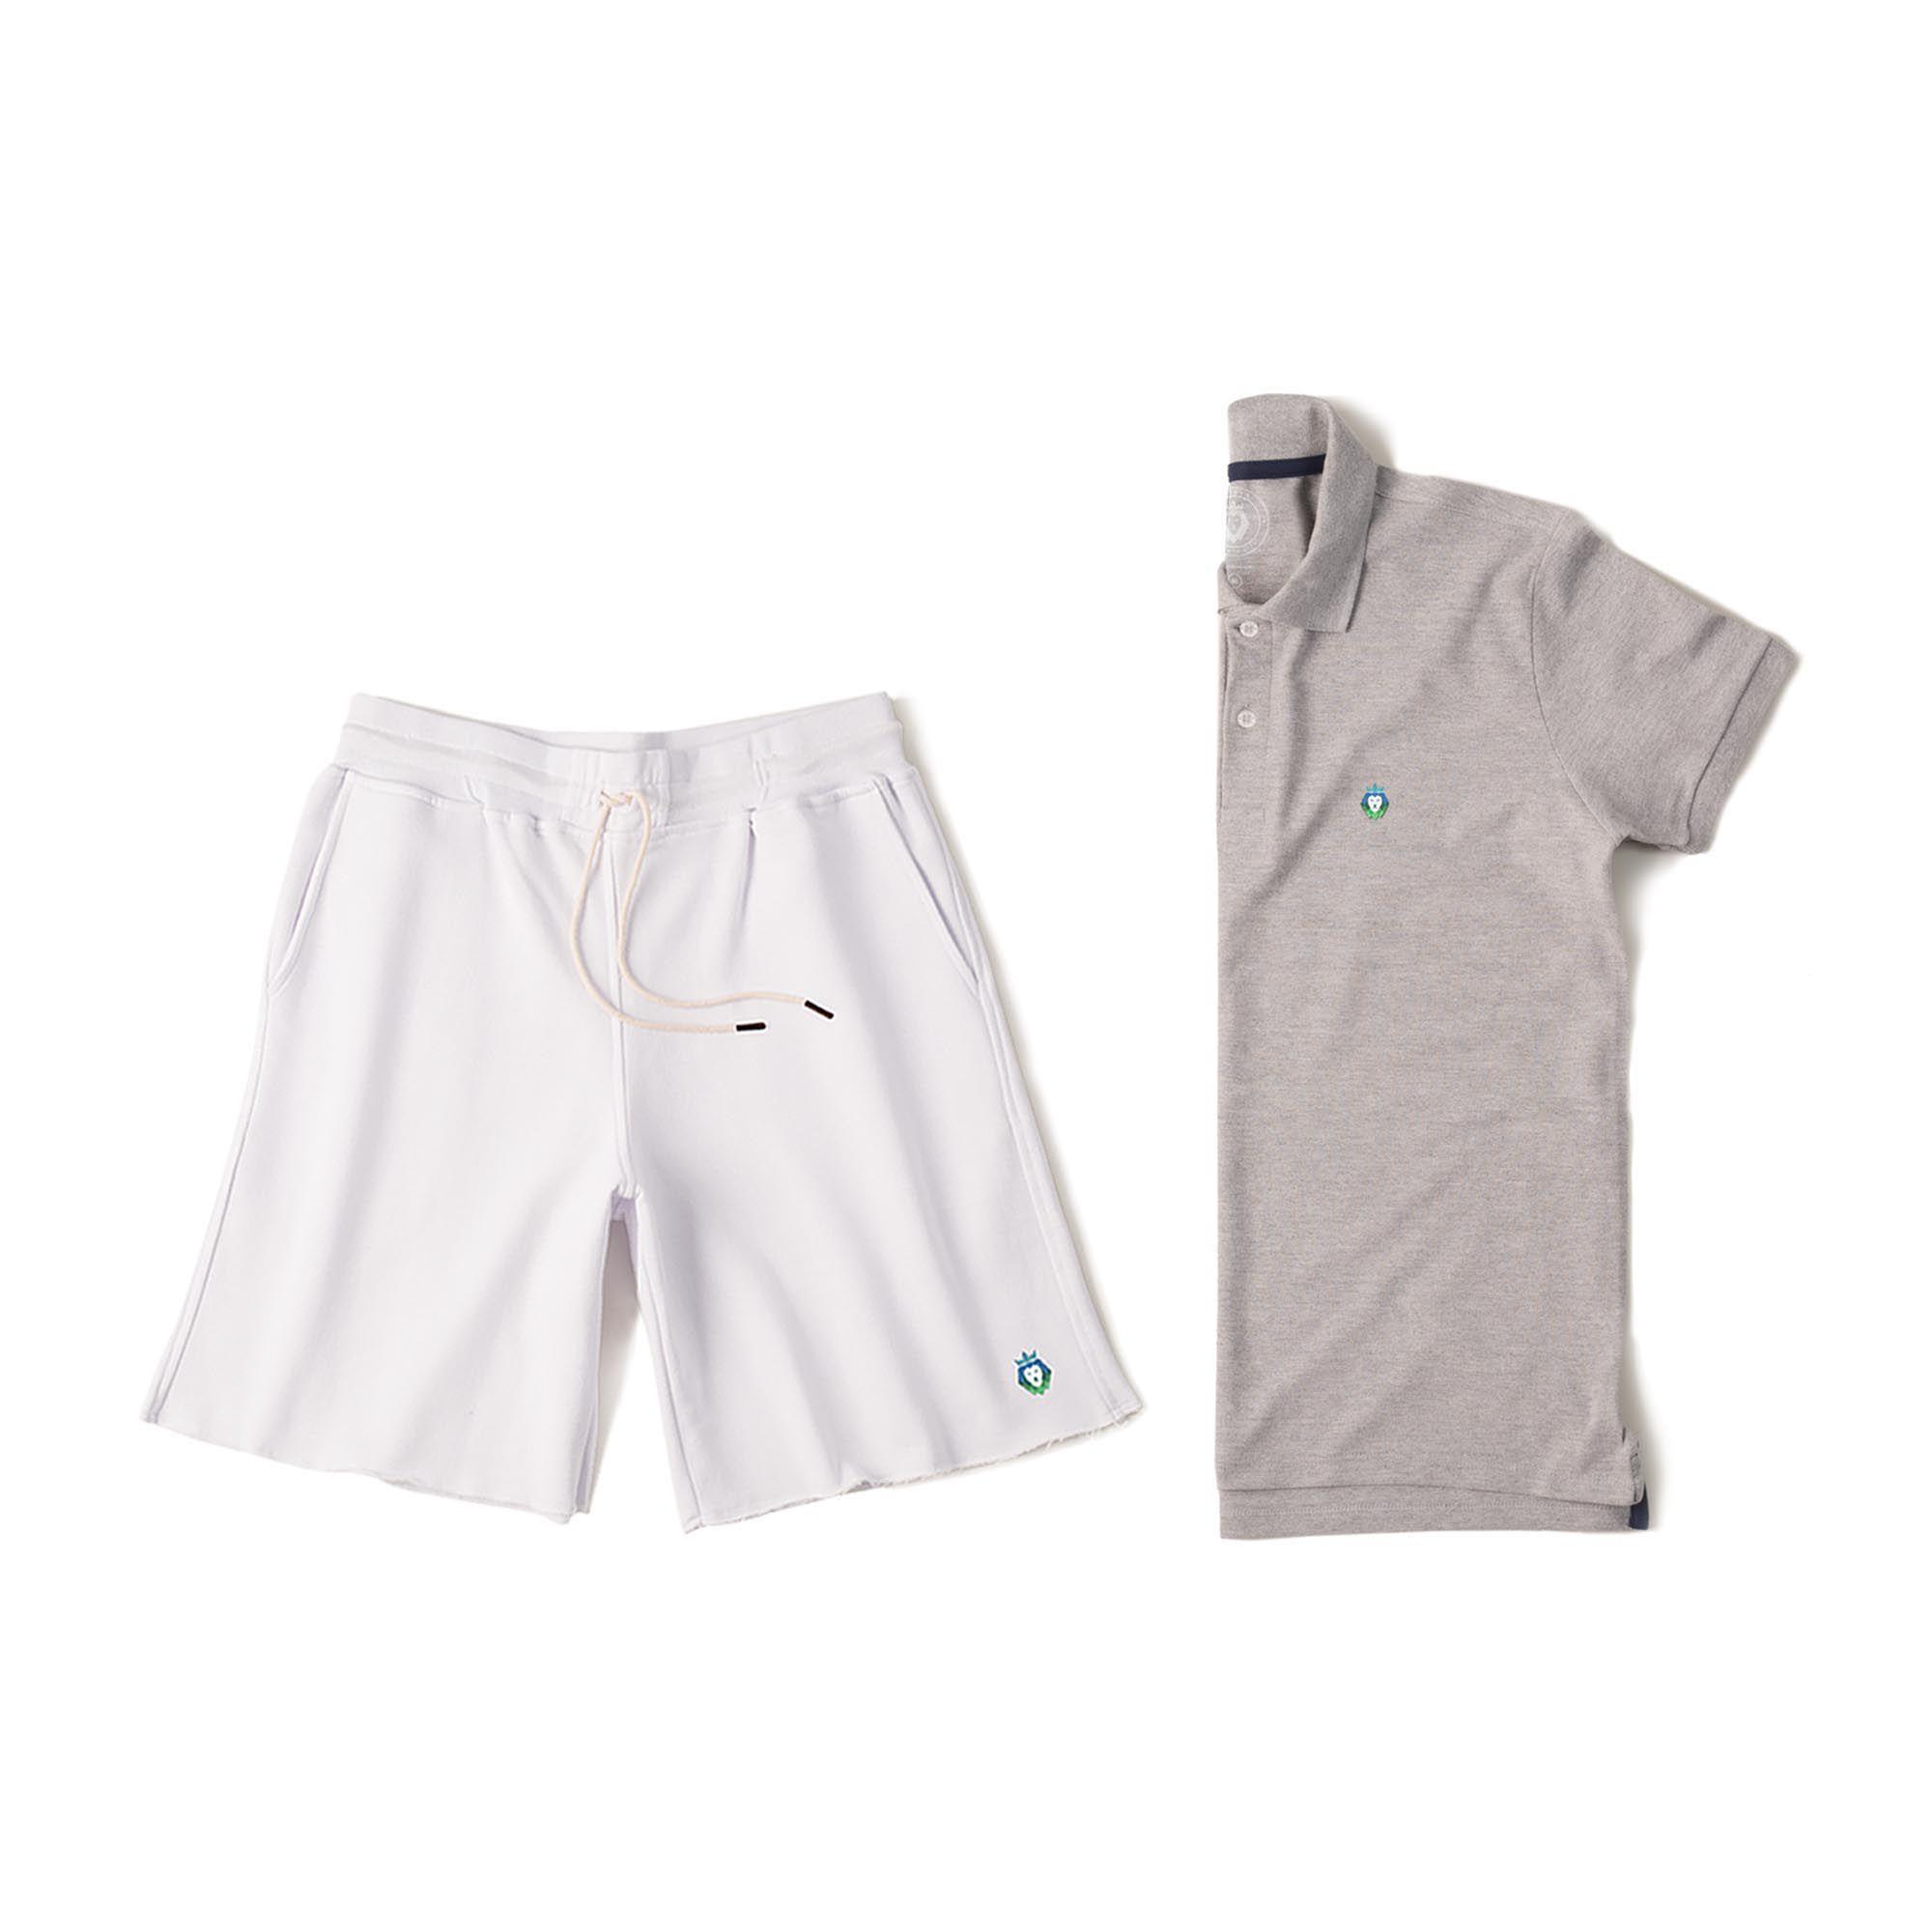 Kit 1 Bermuda Basic Branca + 1 Camisa Polo Style Mescla Zaiden Masculina